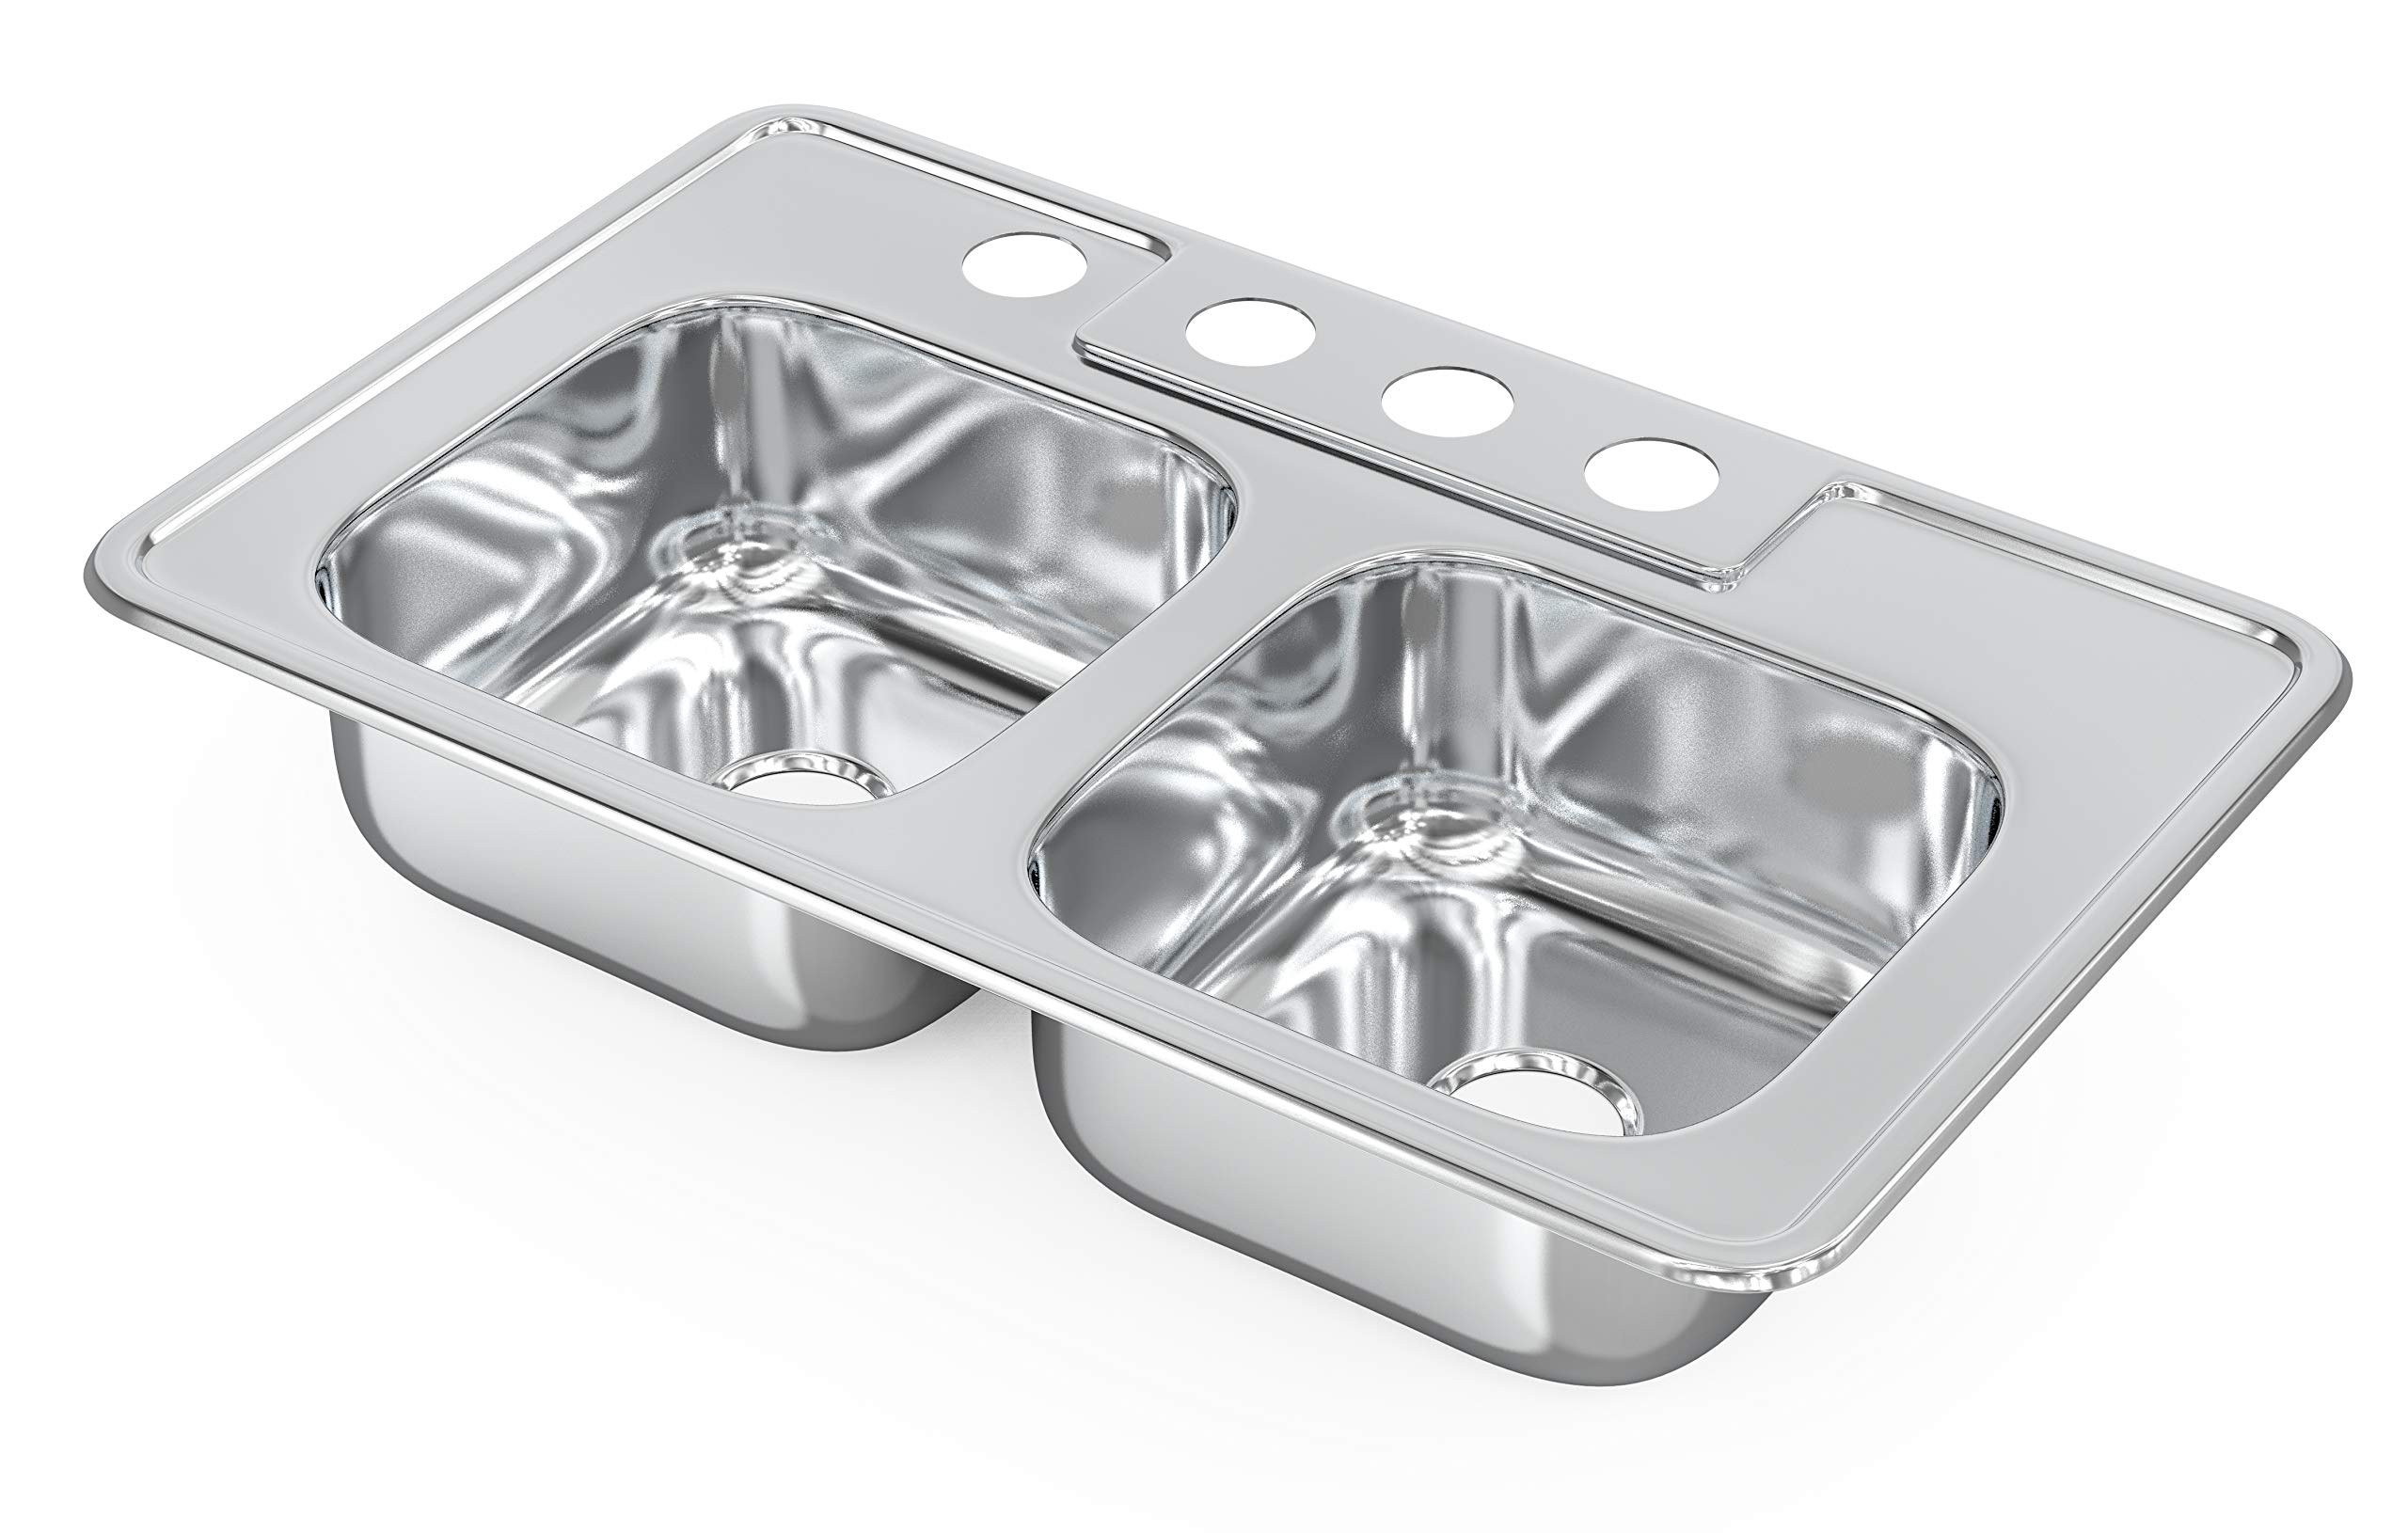 CMI Drop In Kitchen Sink - 33'' x 22'' x 8'' 18 Gauge Stainless Steel Sinks - Top Mount Self-Rimming Double Bowl Design